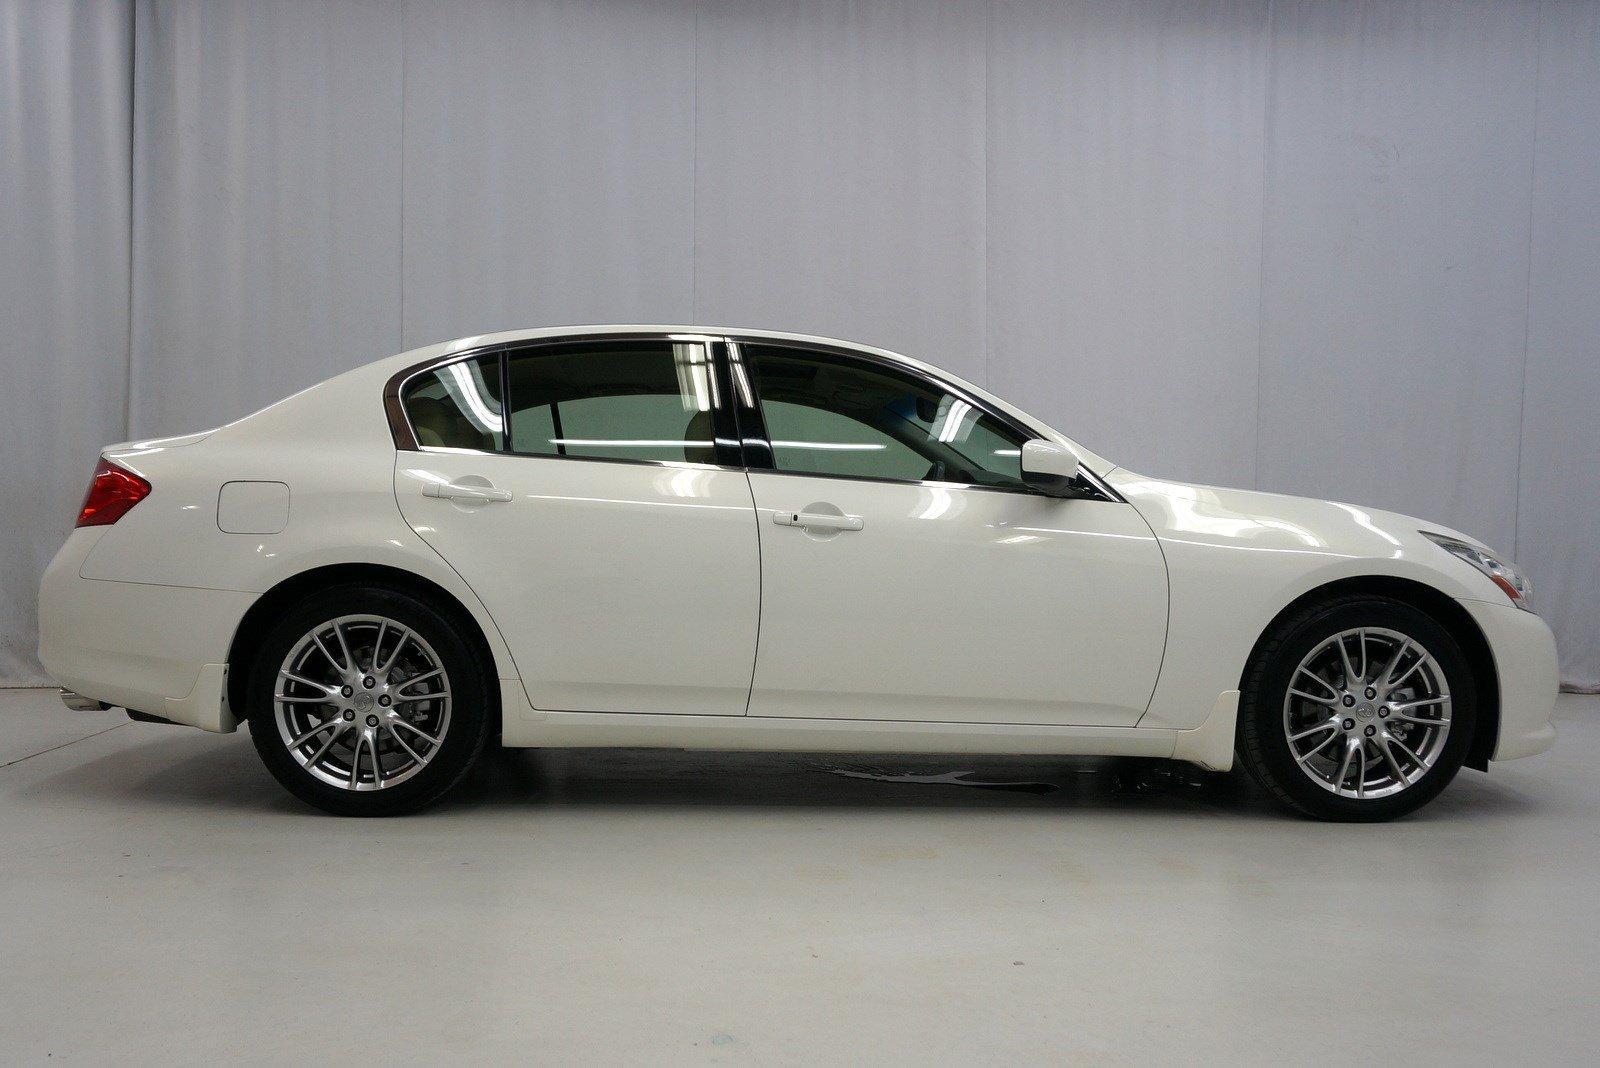 2012 Infiniti G37 Sedan X Sport Appearance Edition Stock M973762 For Sale Near King Of Prussia Pa Pa Infiniti Dealer